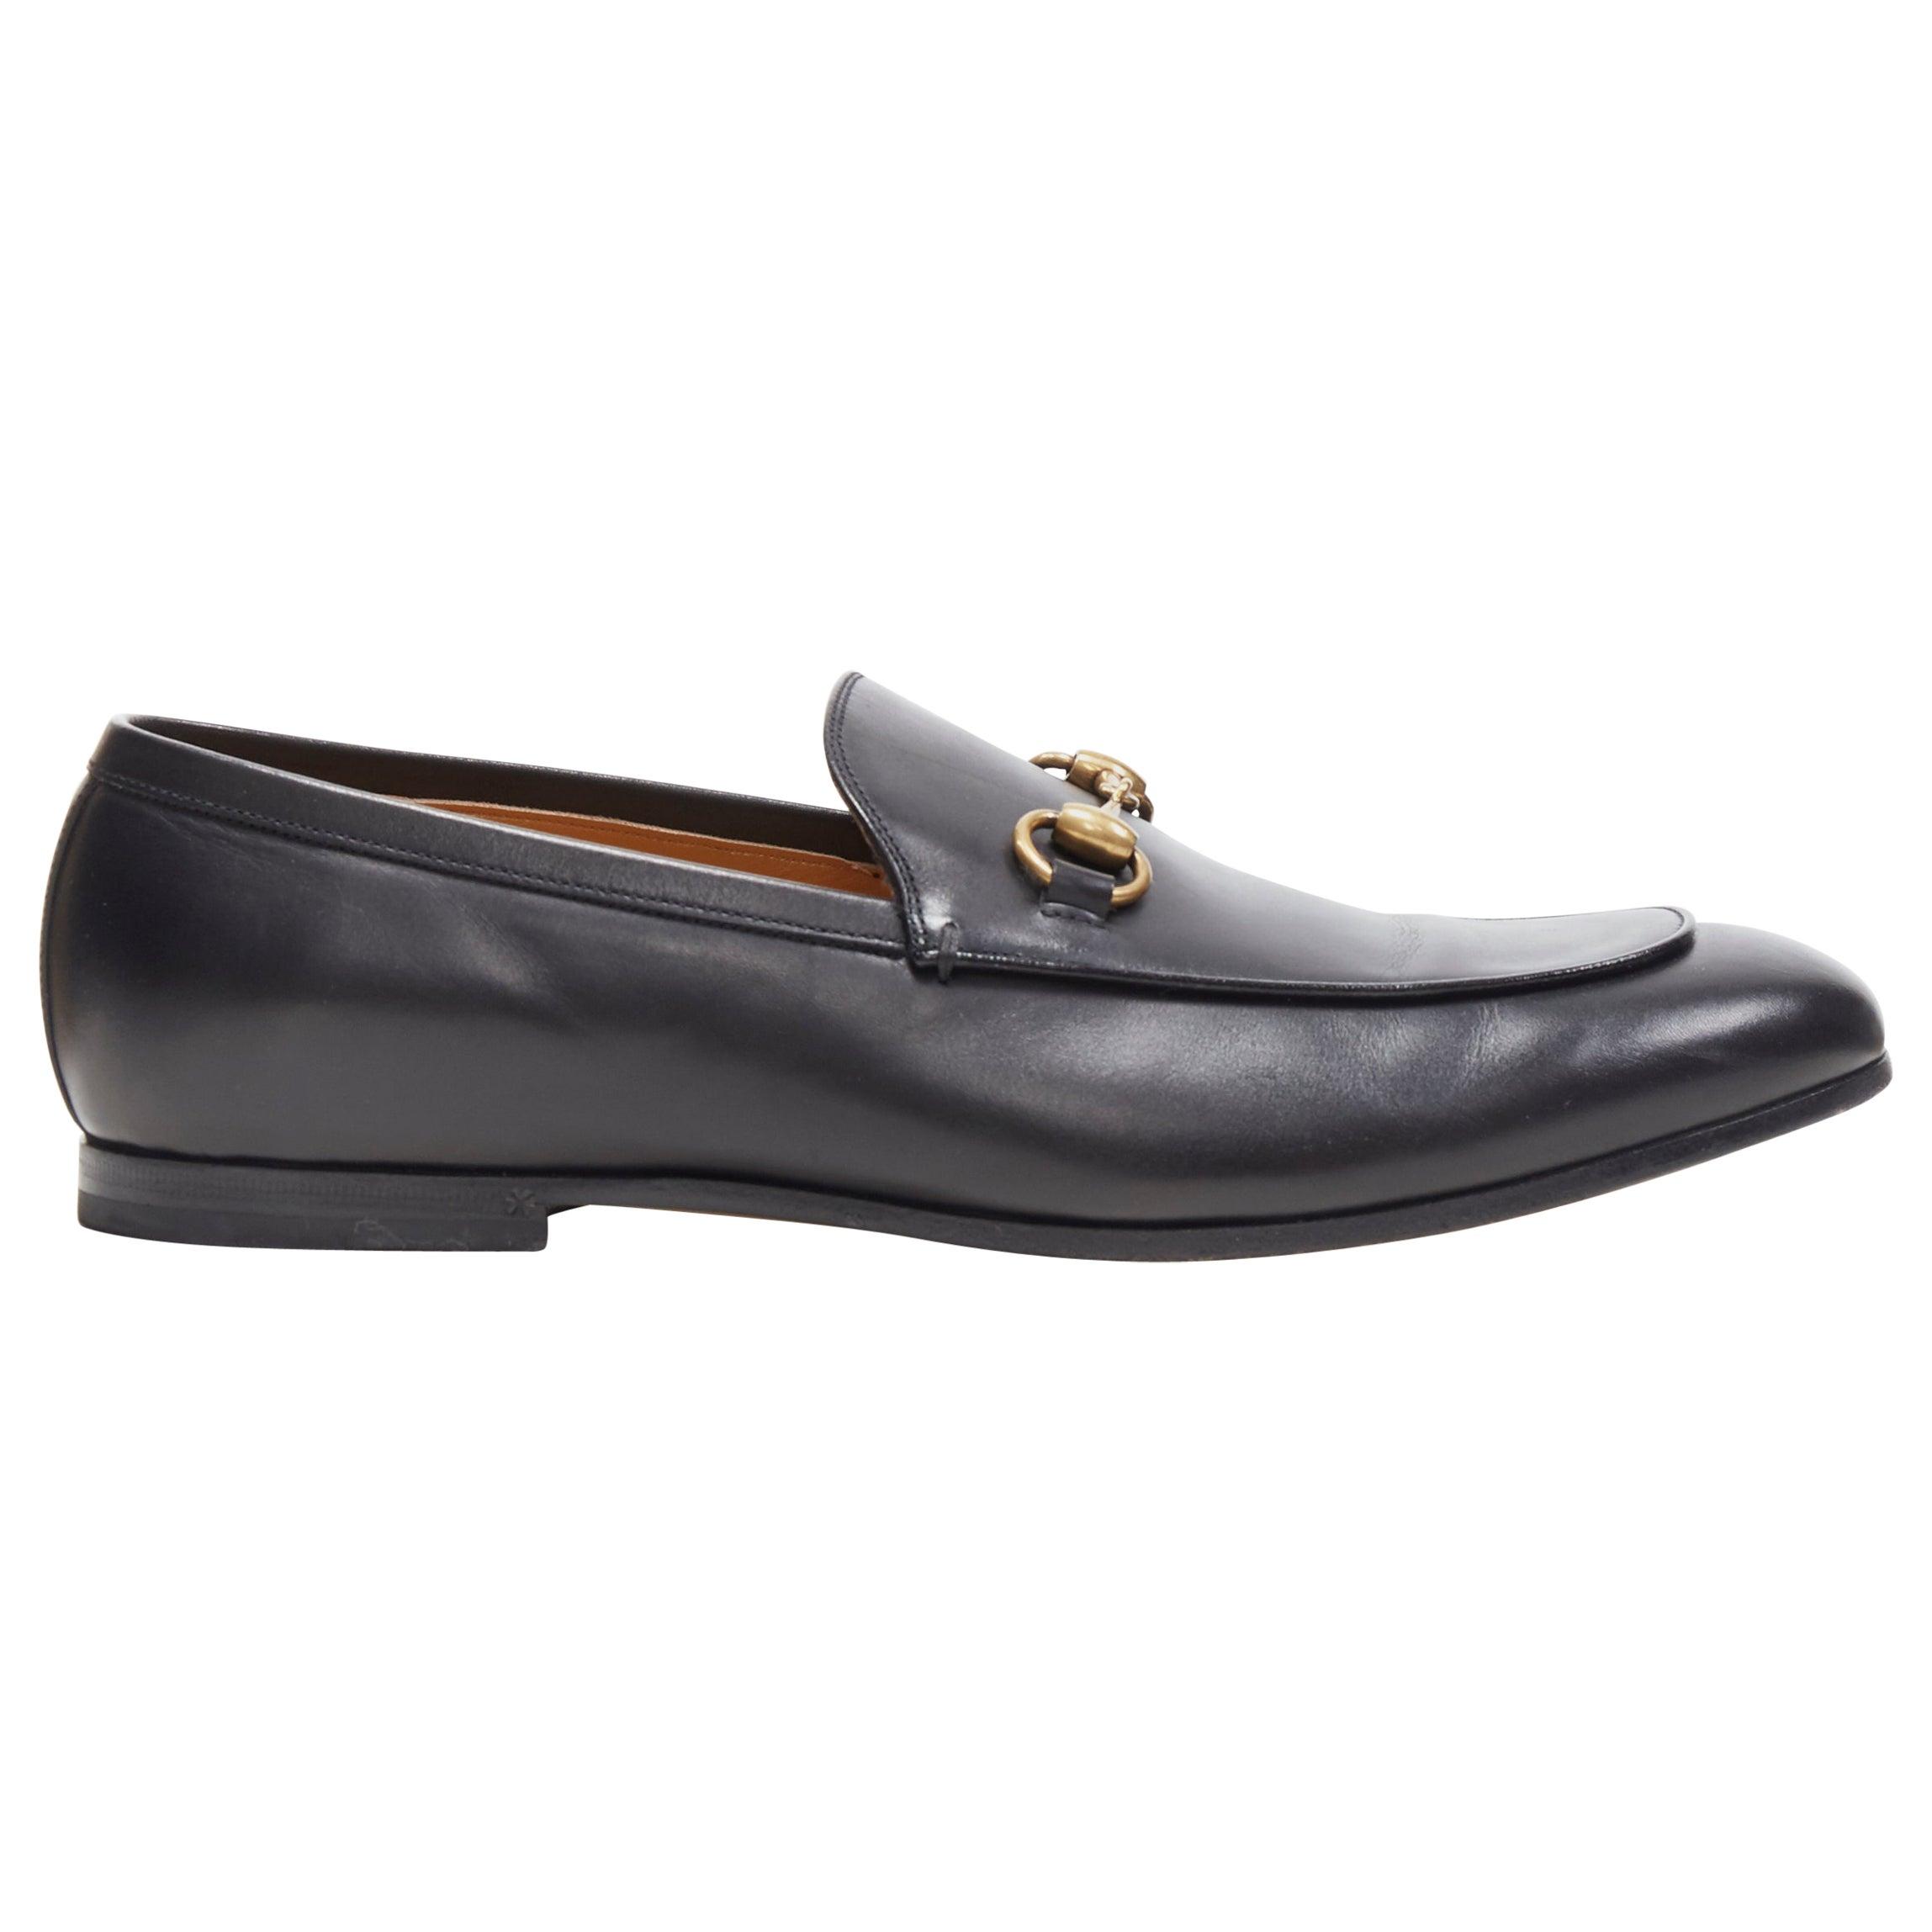 GUCCI Betis Glamour black leather gold horsebit buckle flat loafer UK8 EU42